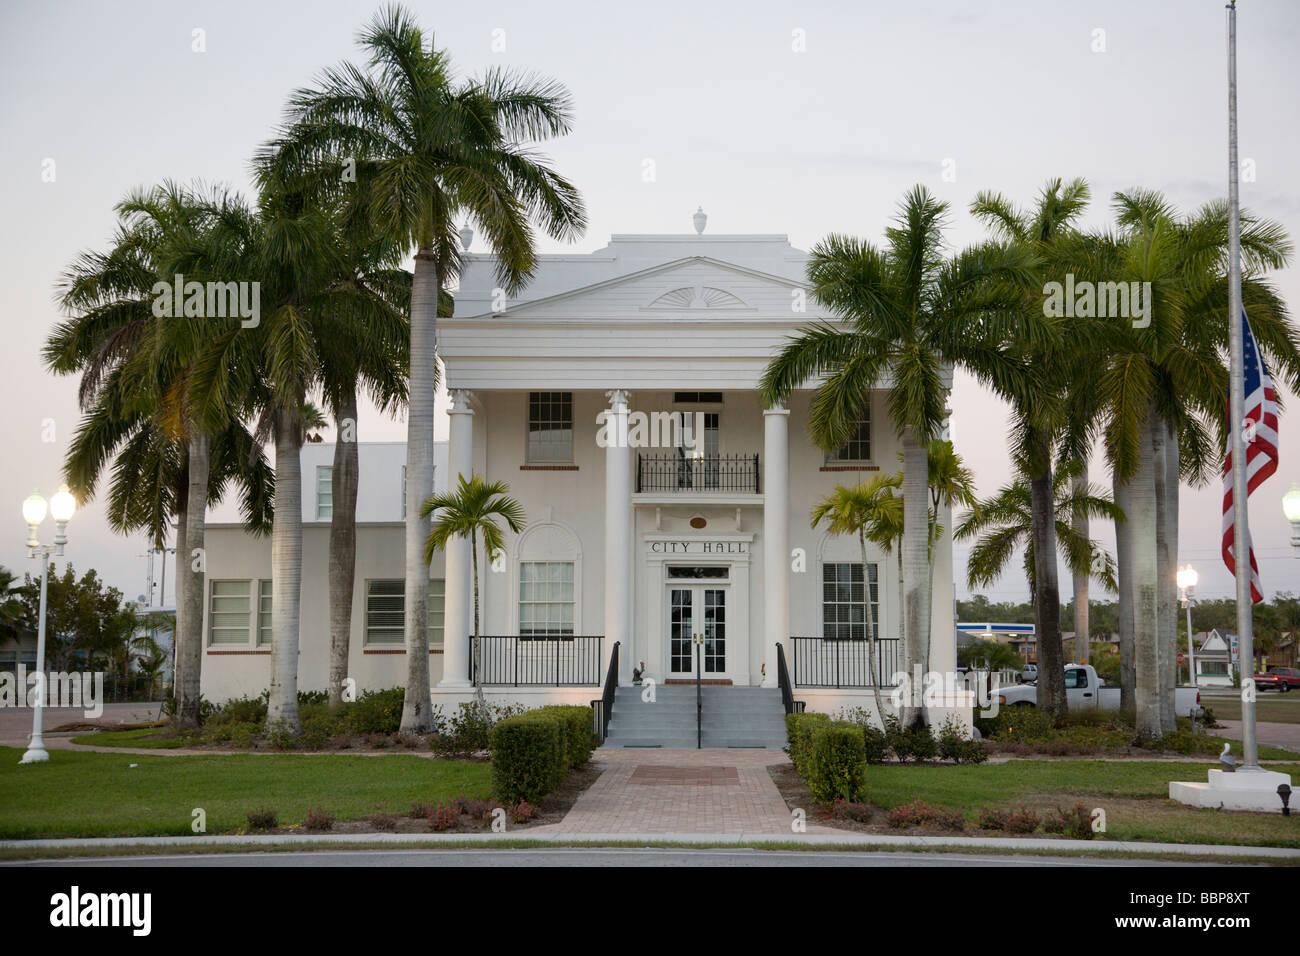 City Hall, Everglades City, Florida - Stock Image